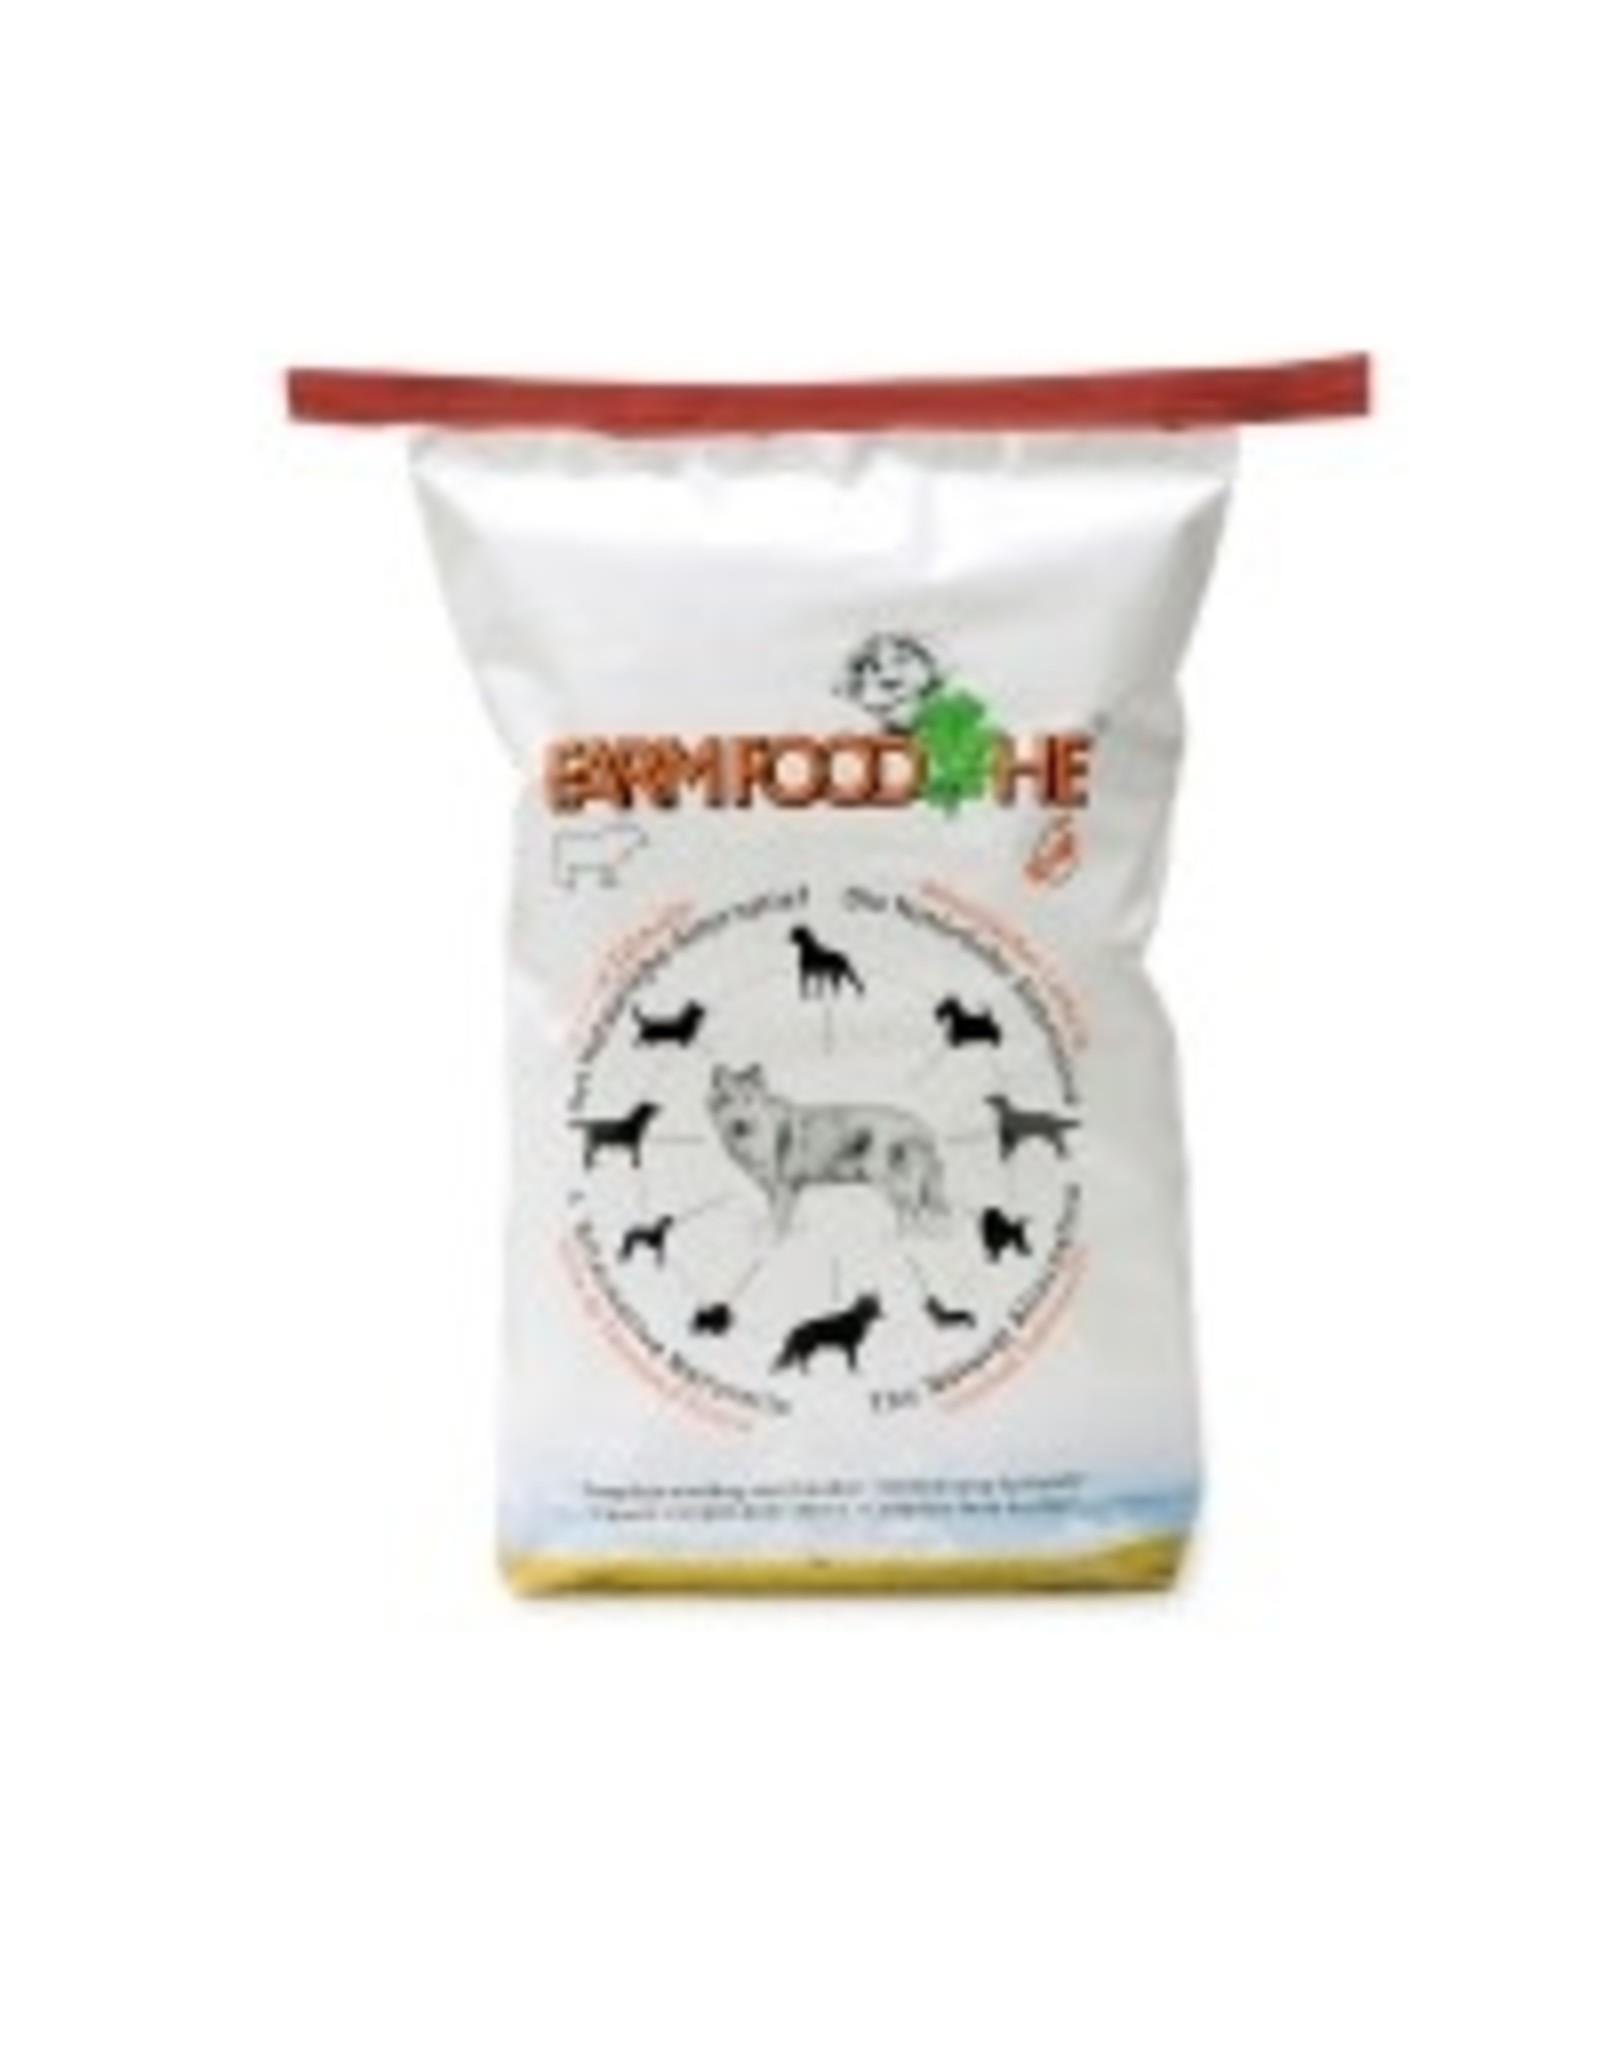 FarmFood HE- Zalmolie 15 kg (papier)